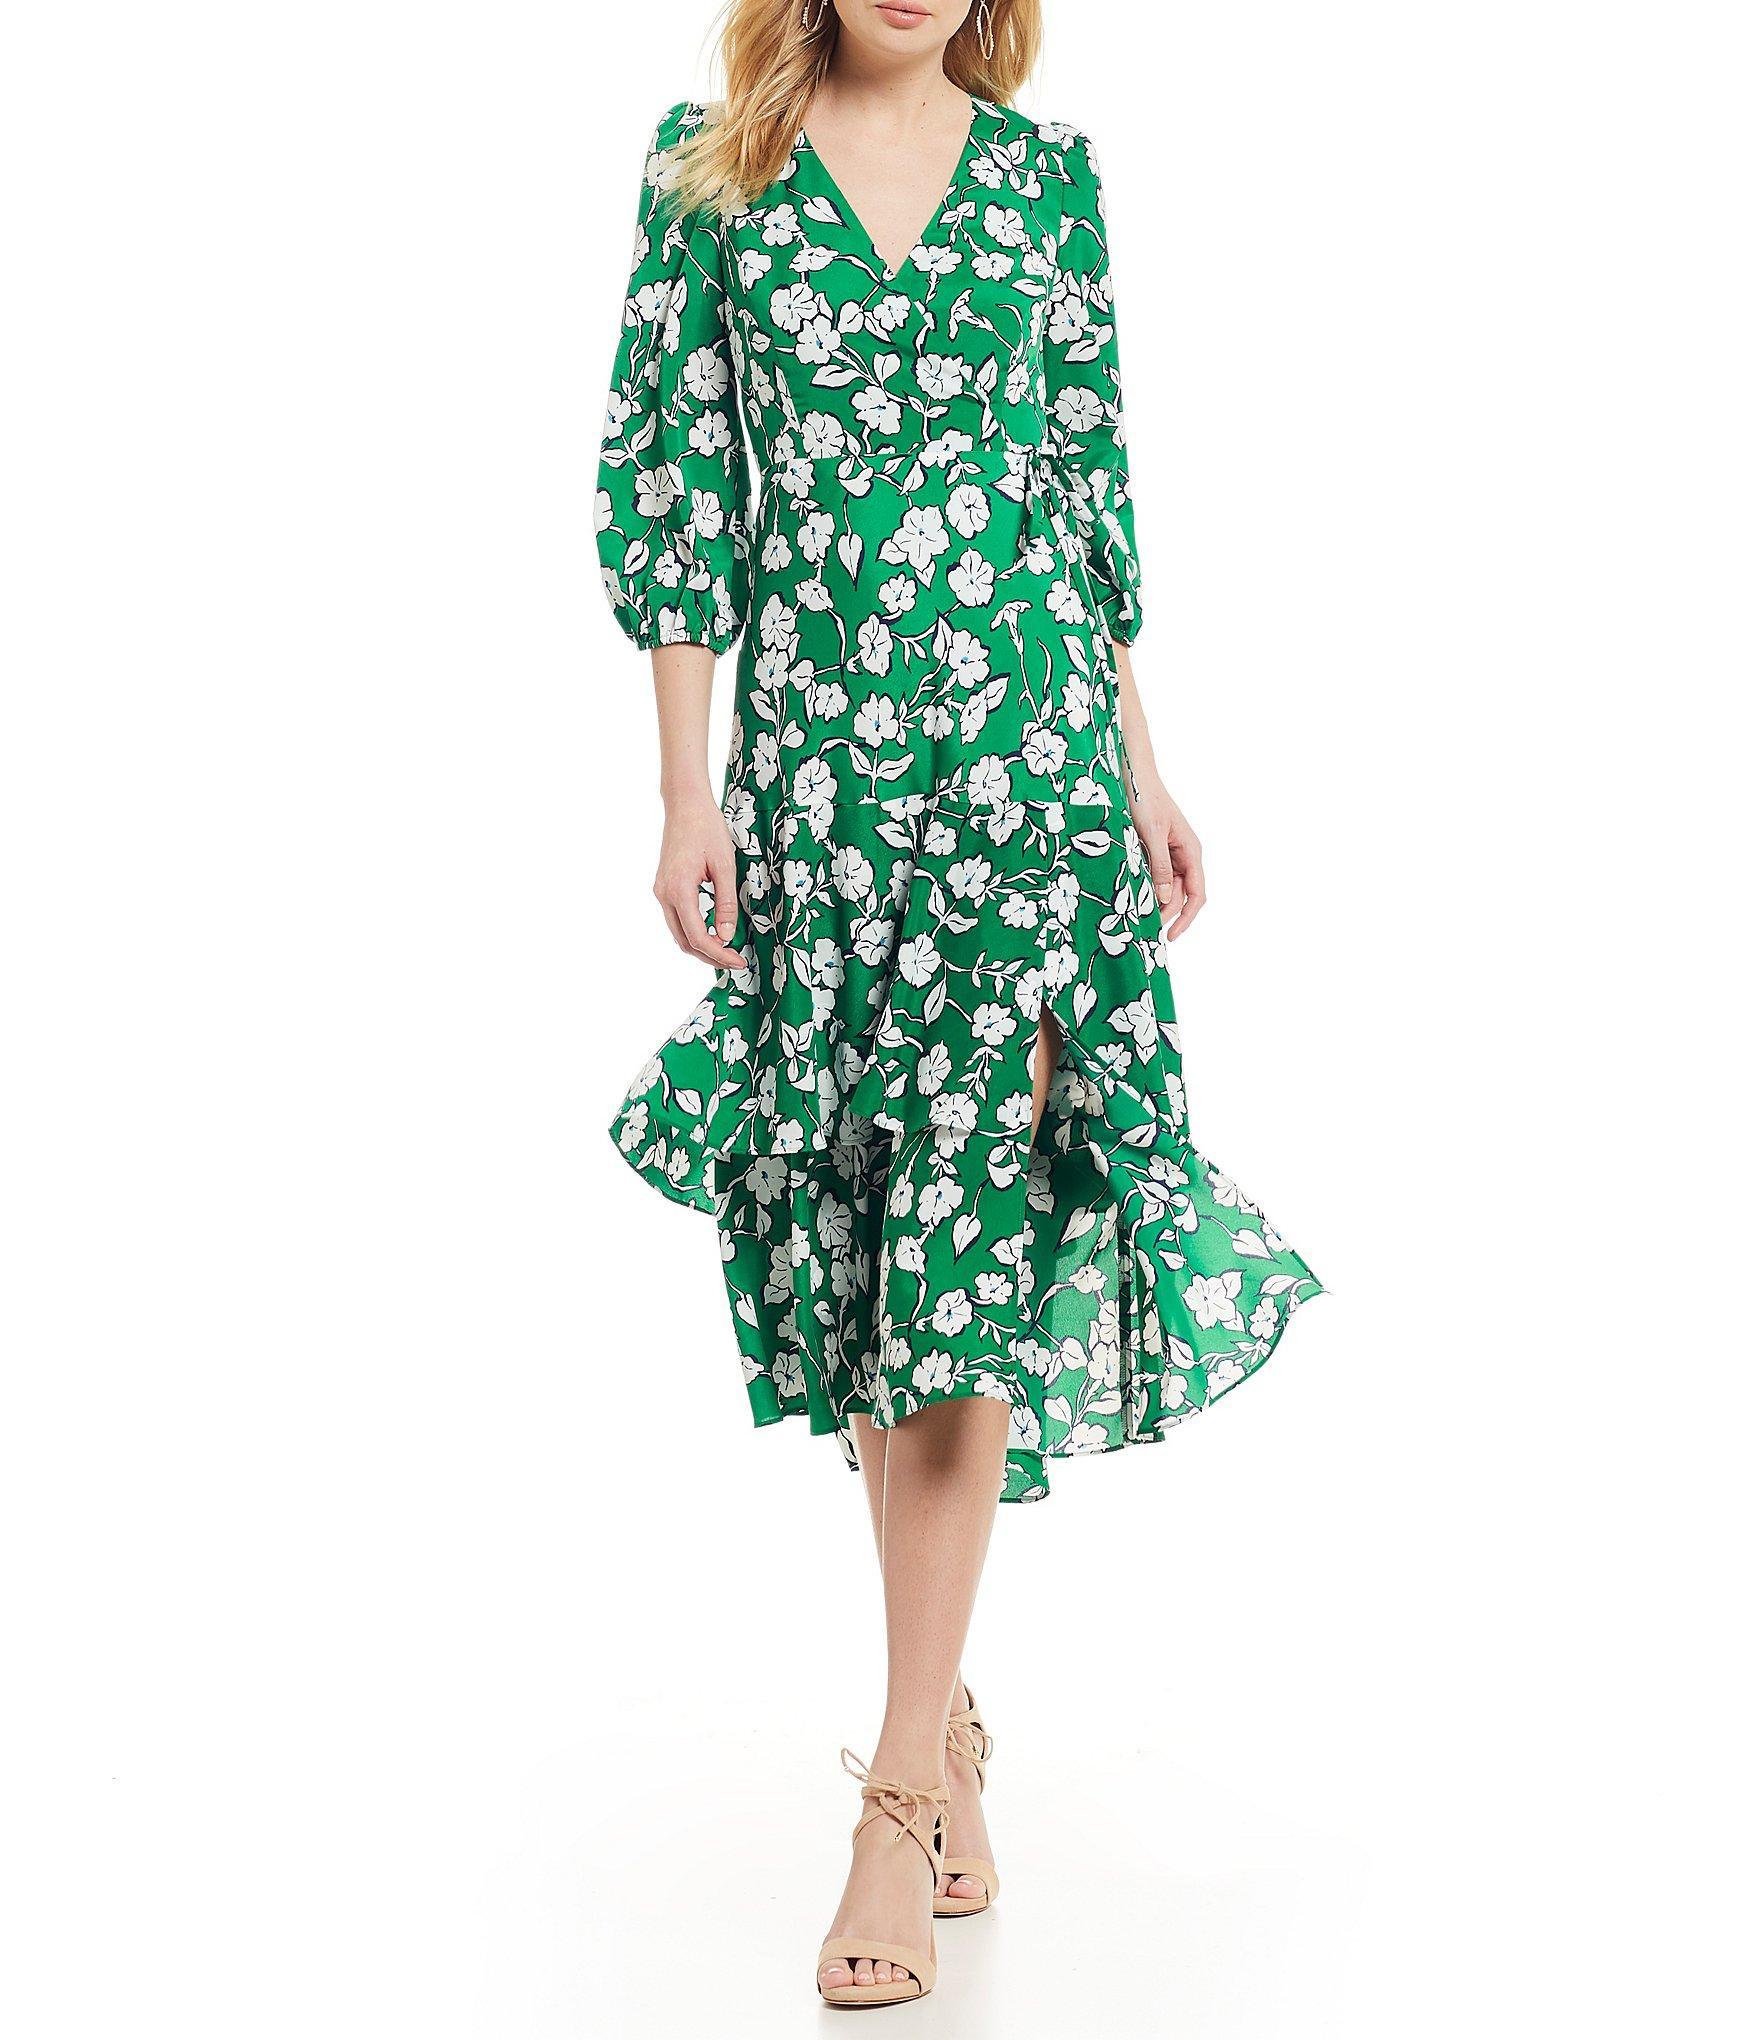 d0410cfc0c2 Lyst - Eliza J Floral Print Surplice V-neck Midi Length Wrap Dress ...